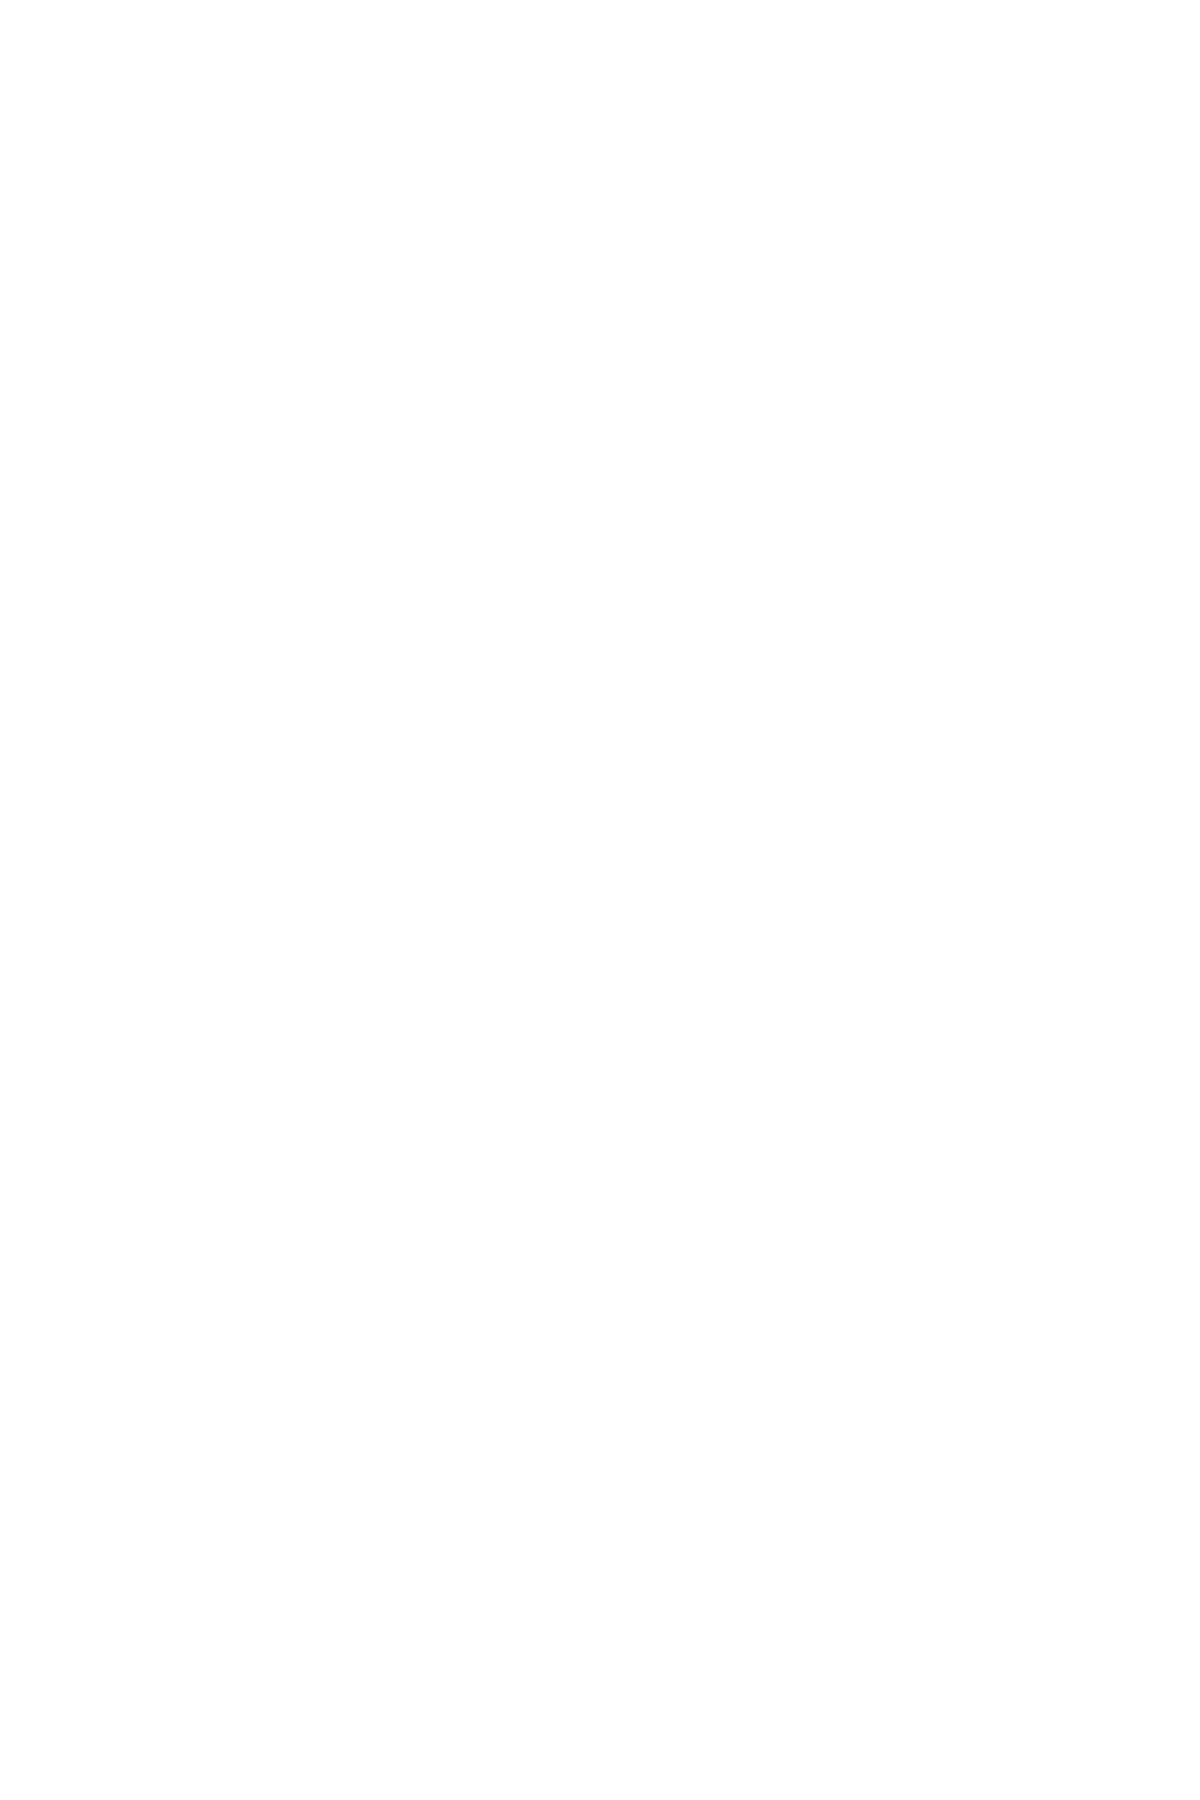 Уажәтәи аҧсуа бызшәа аеколингвистикатә аҭҵаара